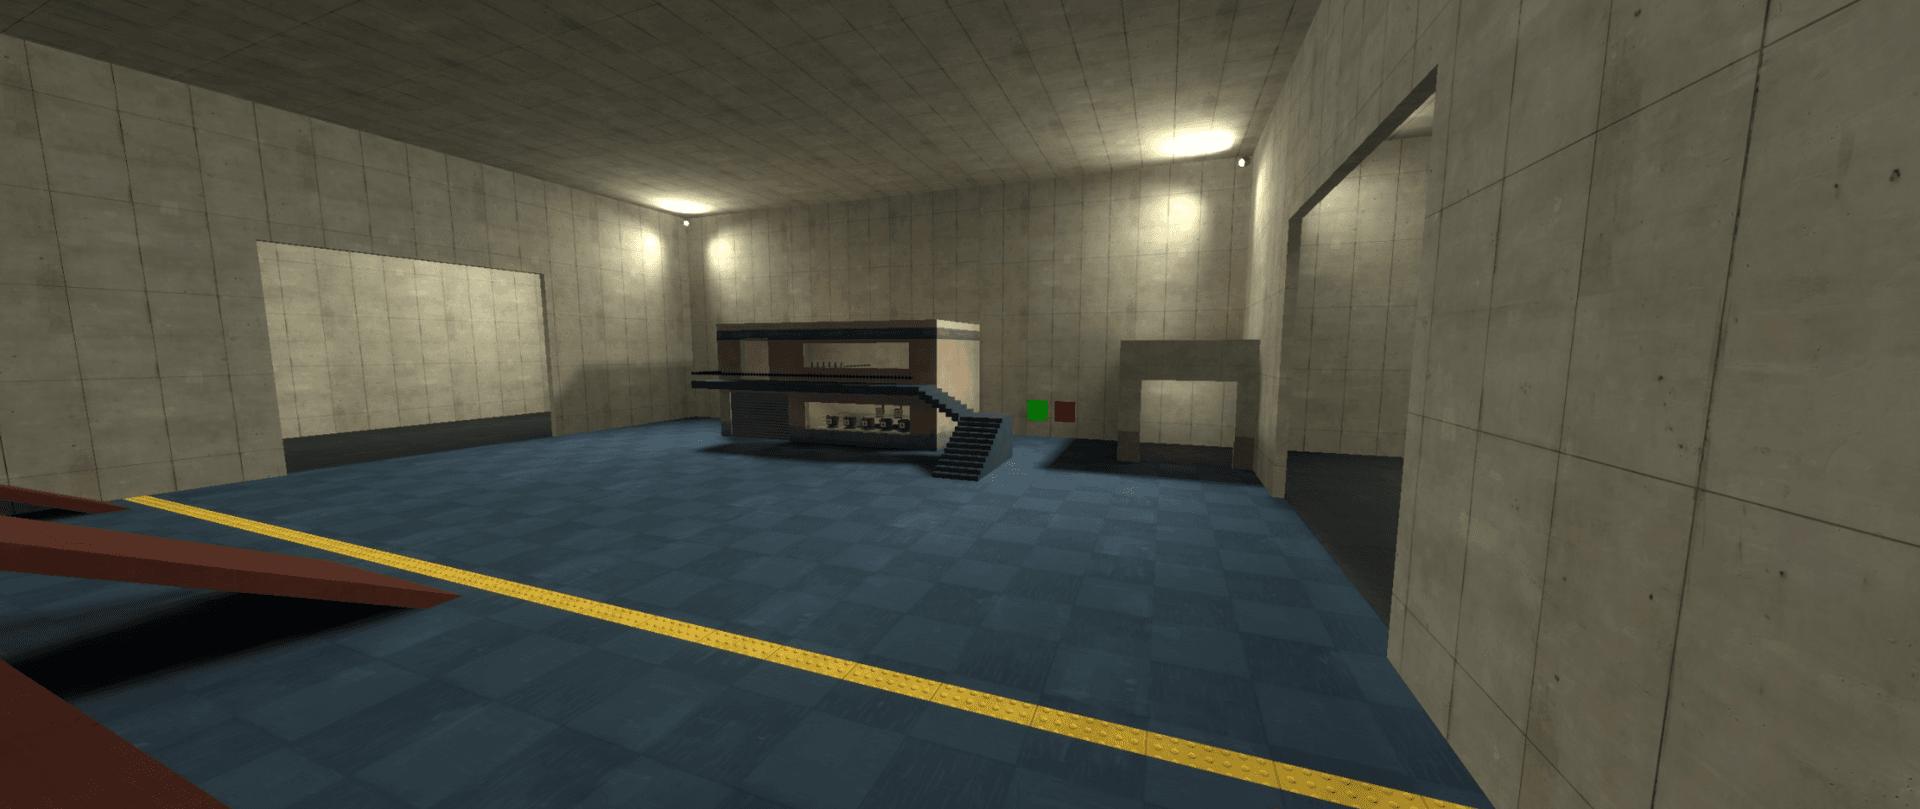 JailbreakMap1.PNG